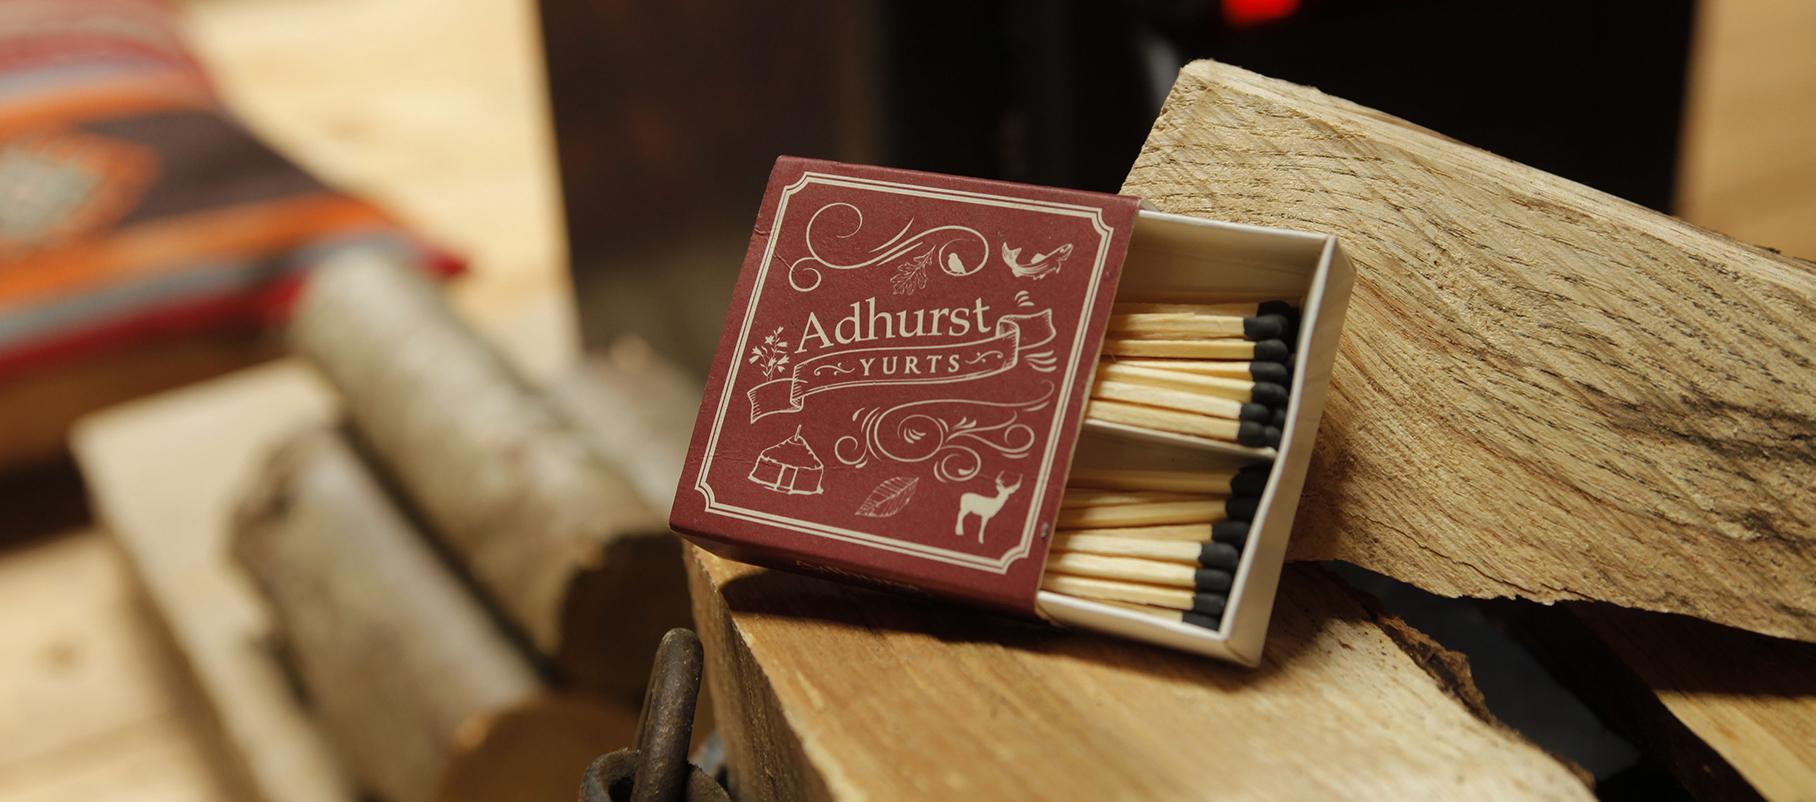 The Adhurst Edit